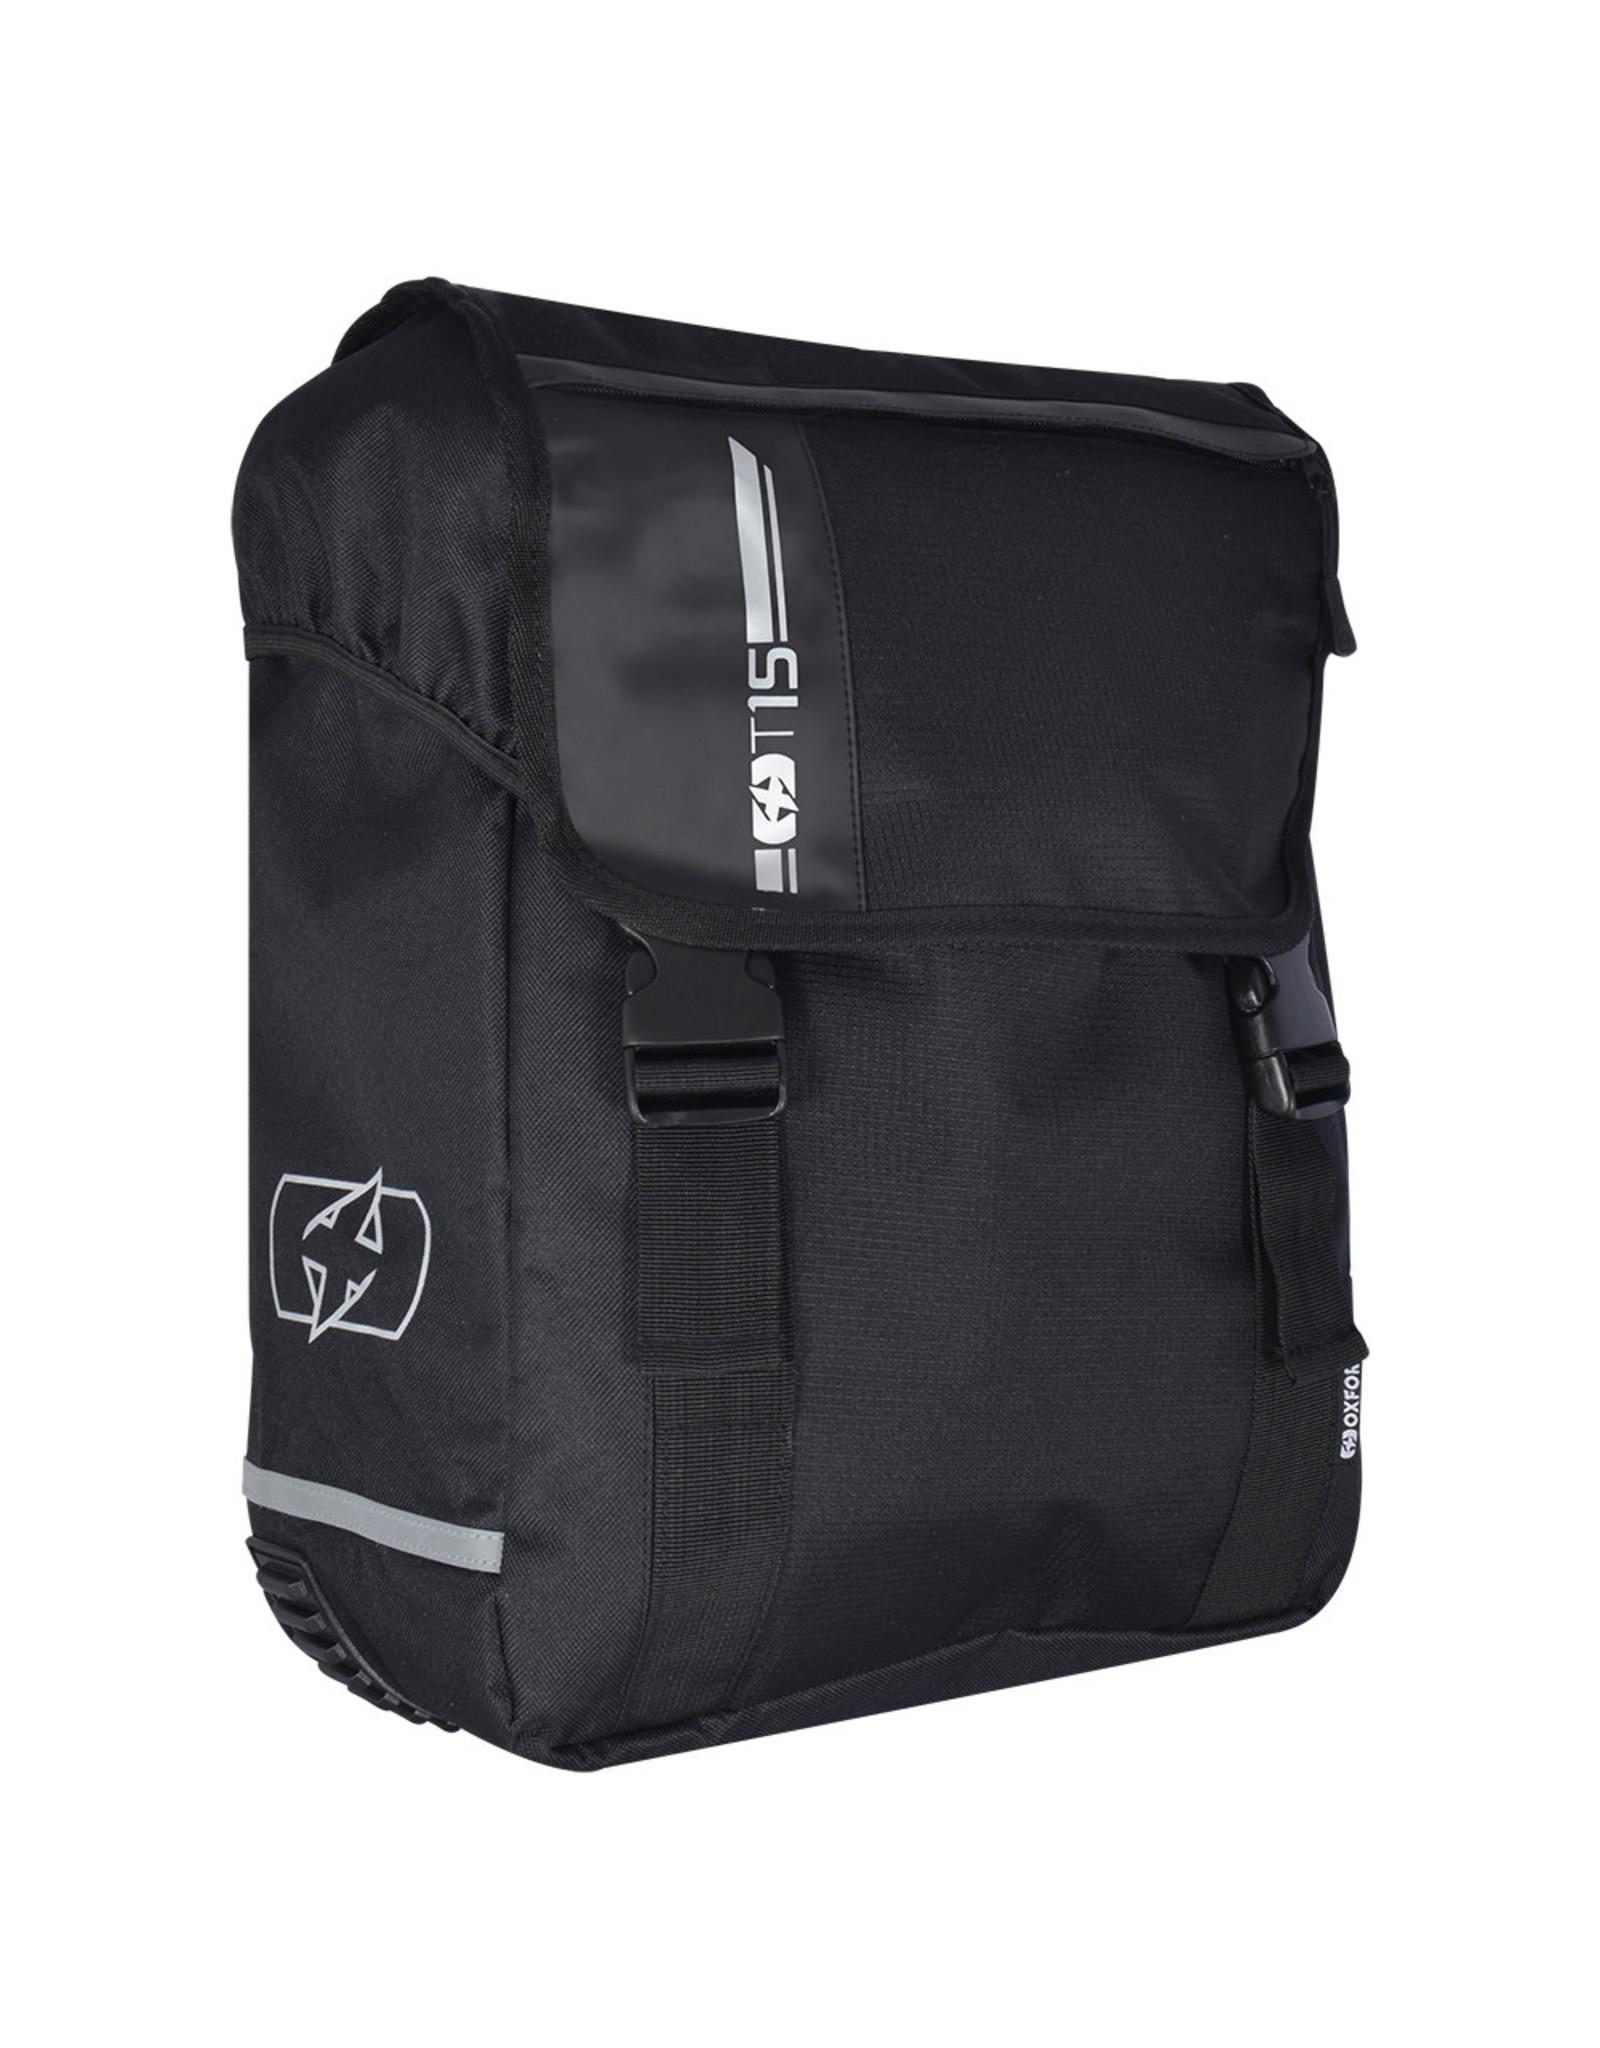 Oxford T15 Pannier Bag 15L sacoche